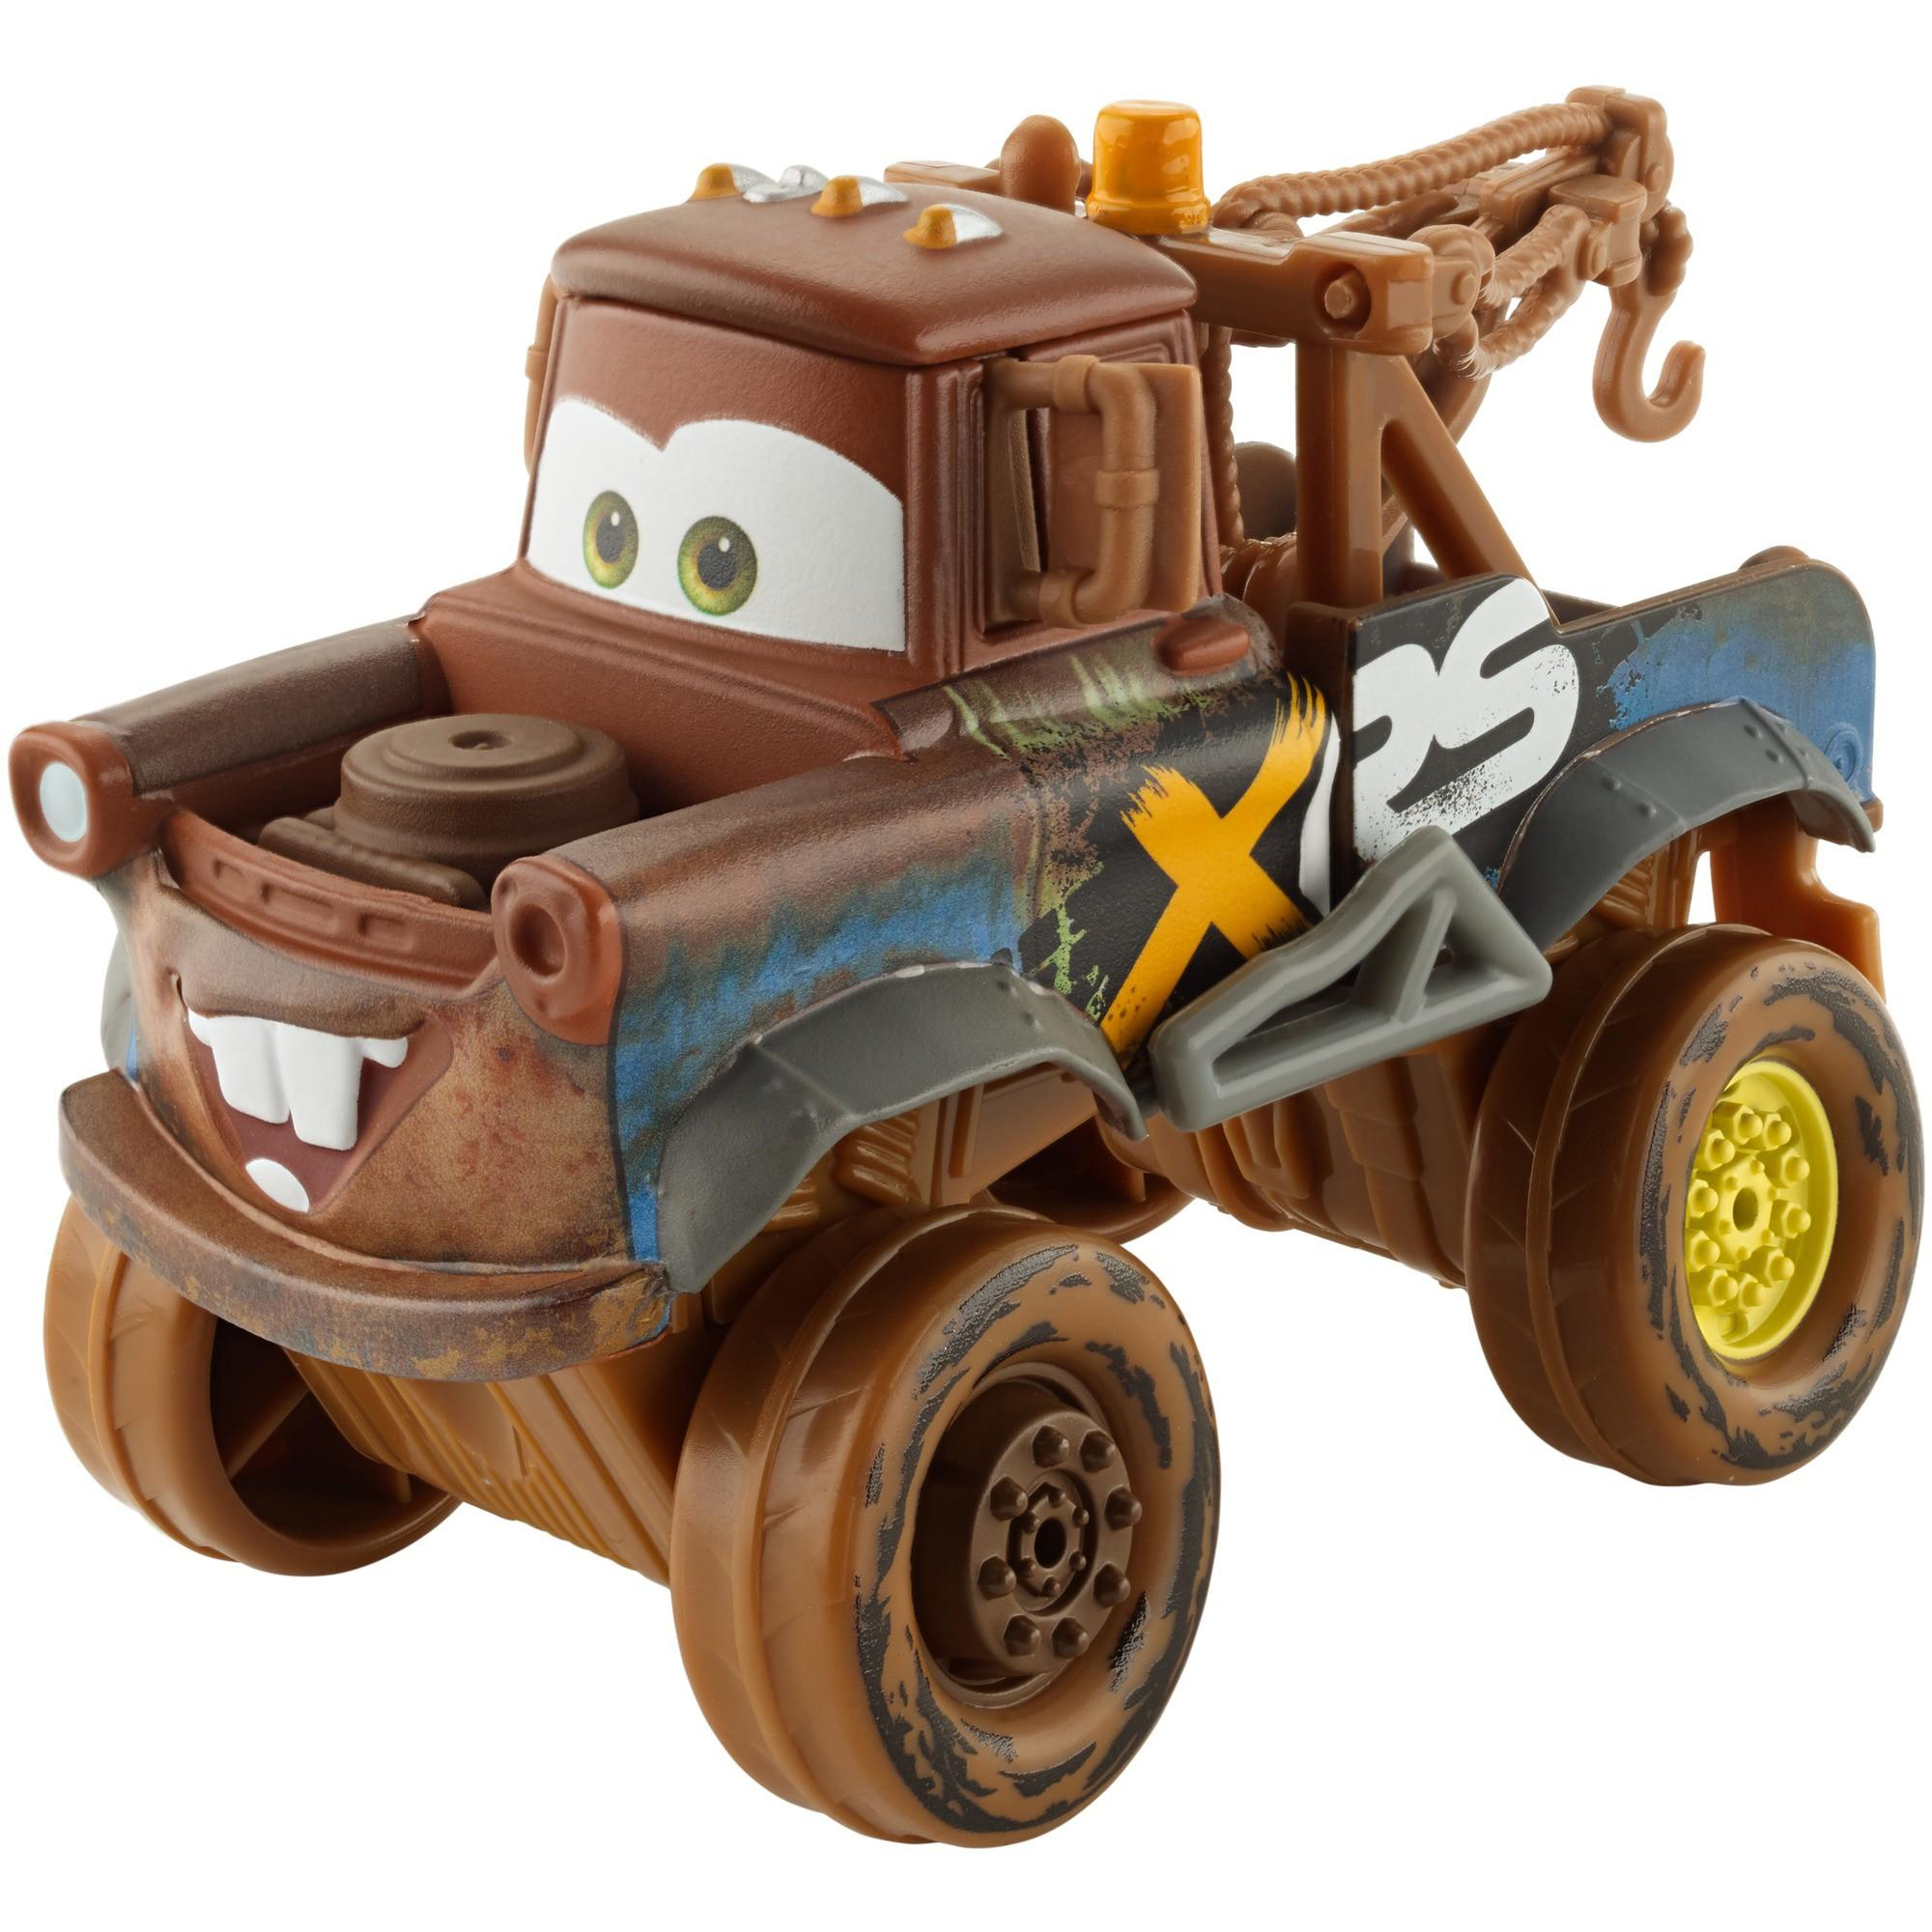 Disney/Pixar Cars XRS Mud Racing Mater Oversized Vehicle